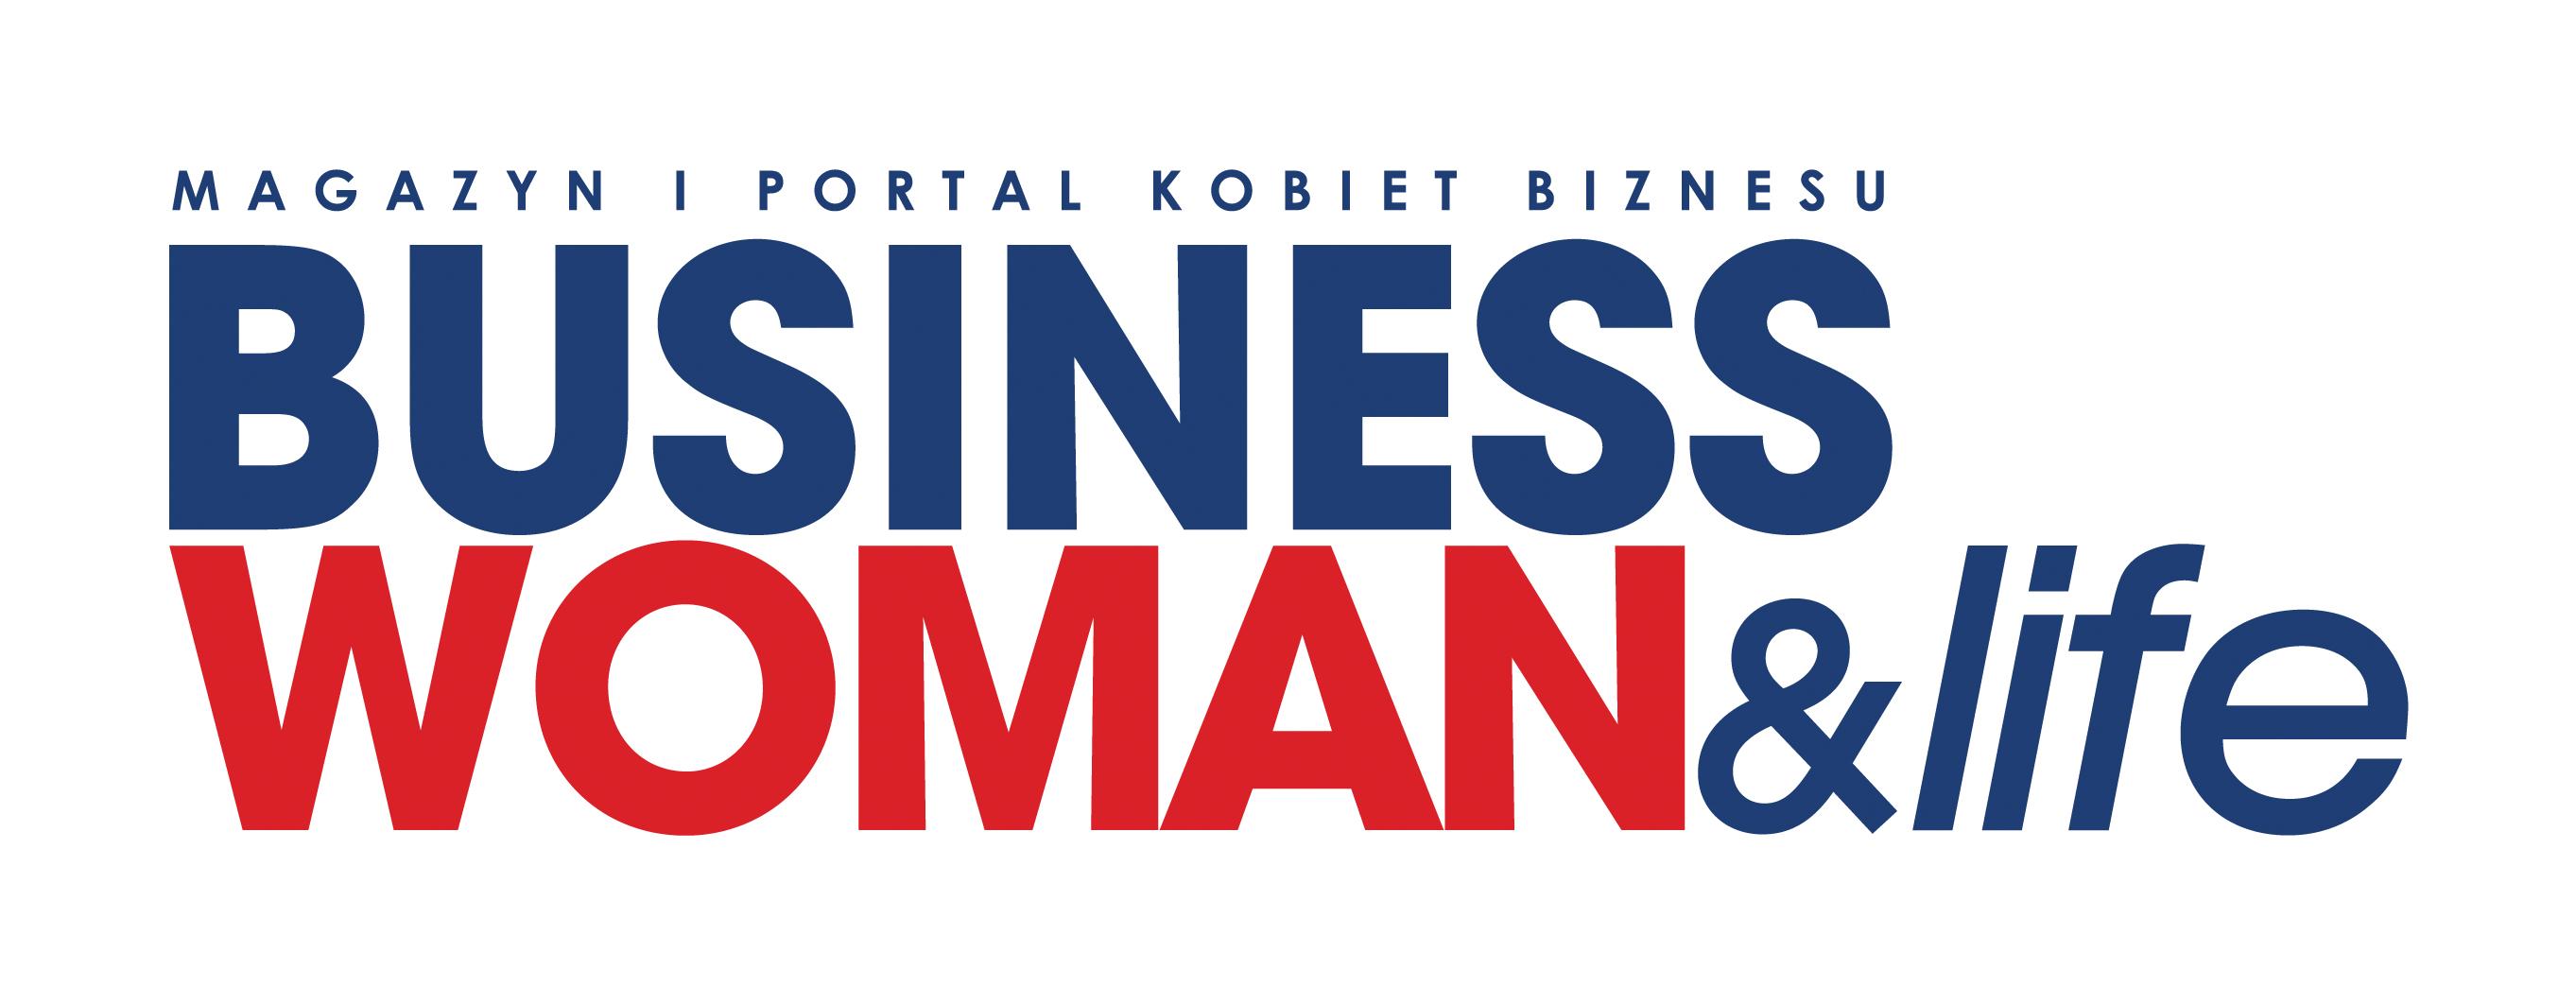 BUSINESSWOMAN & LIFE